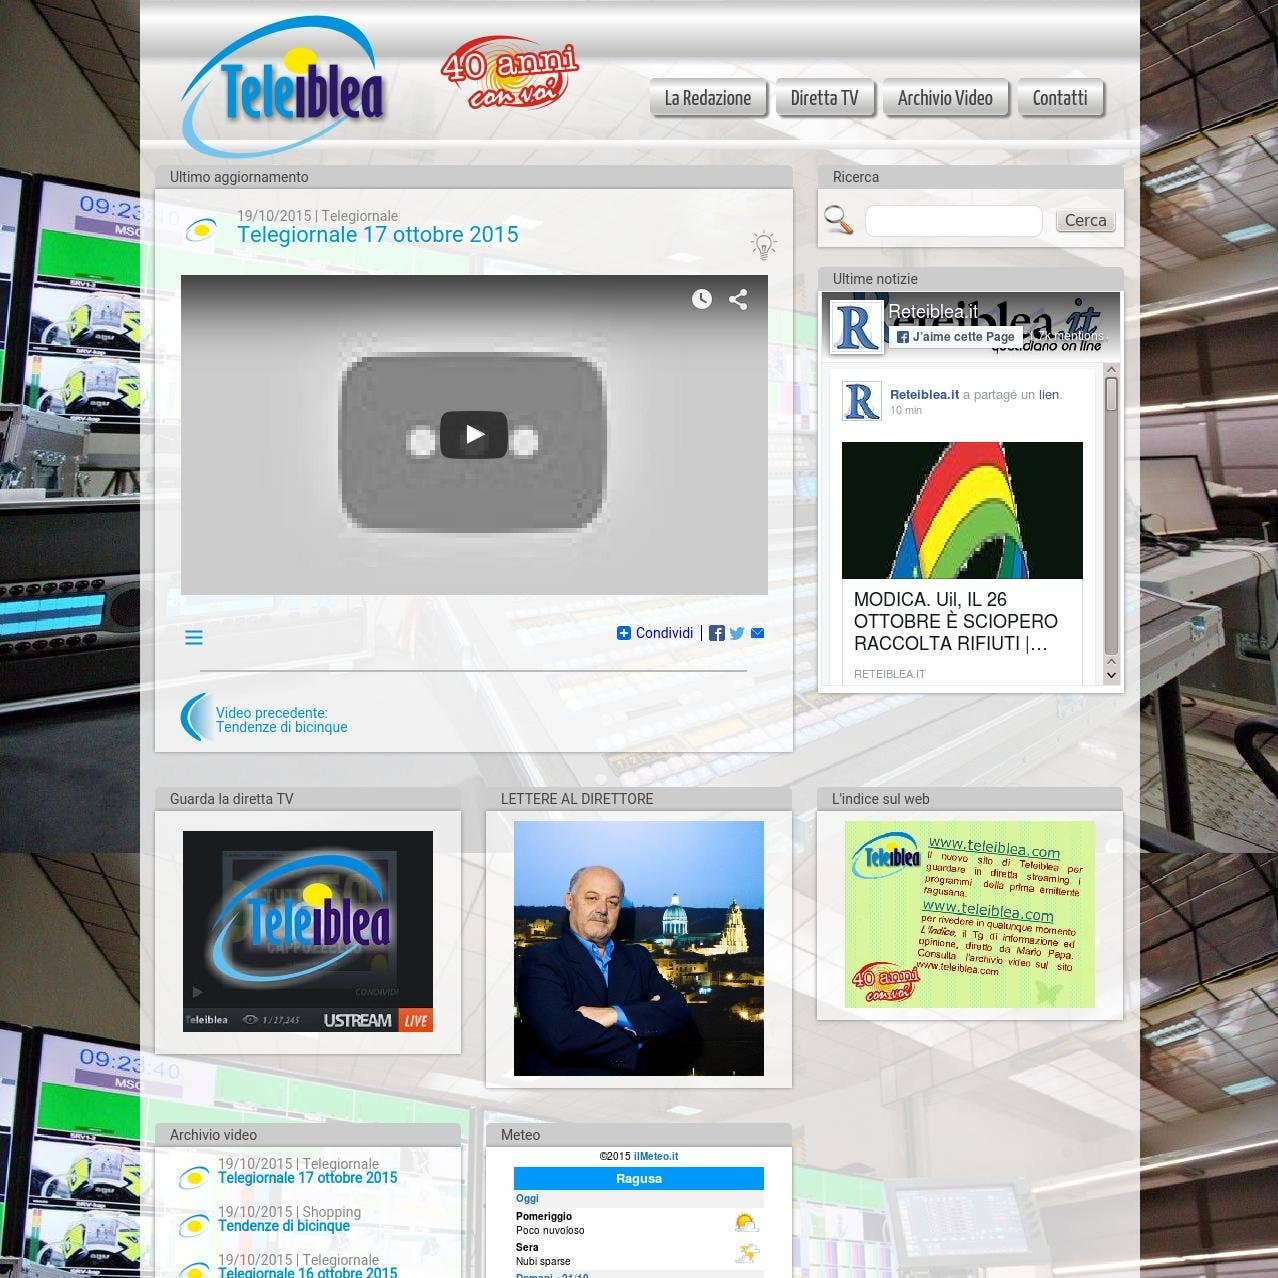 Tele Iblea TV